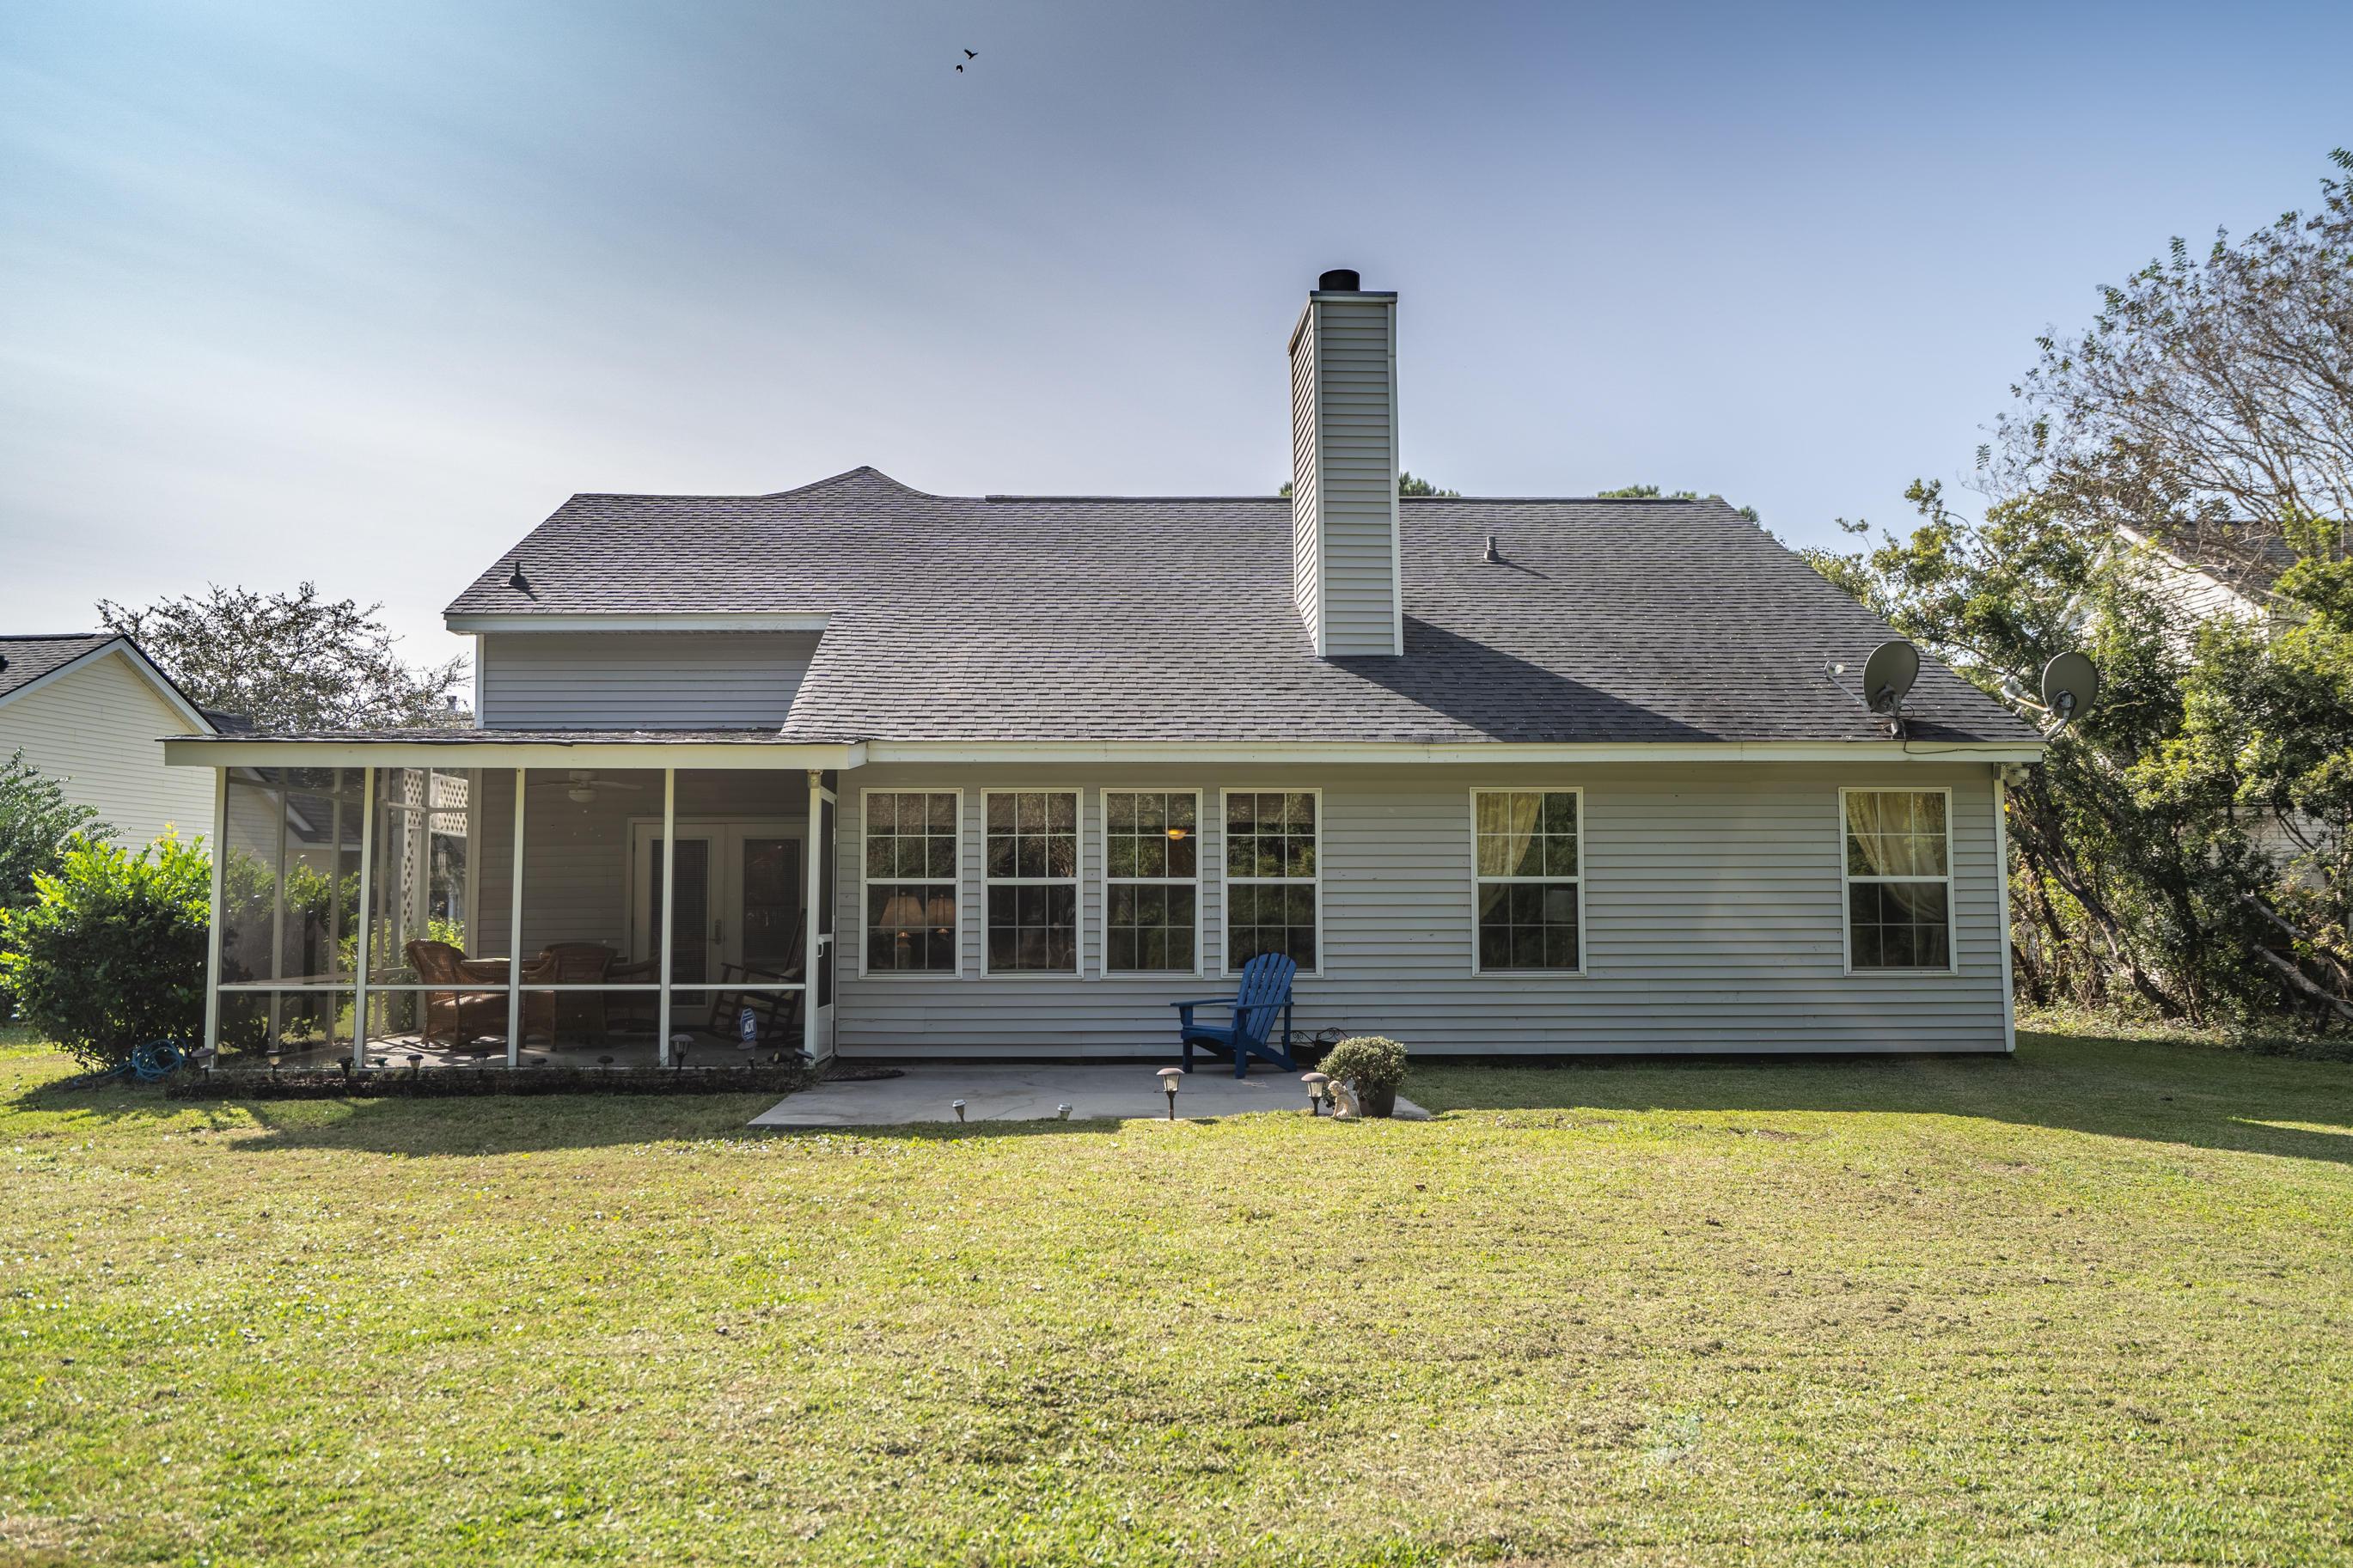 Dunes West Homes For Sale - 2780 Palmetto Hall, Mount Pleasant, SC - 3